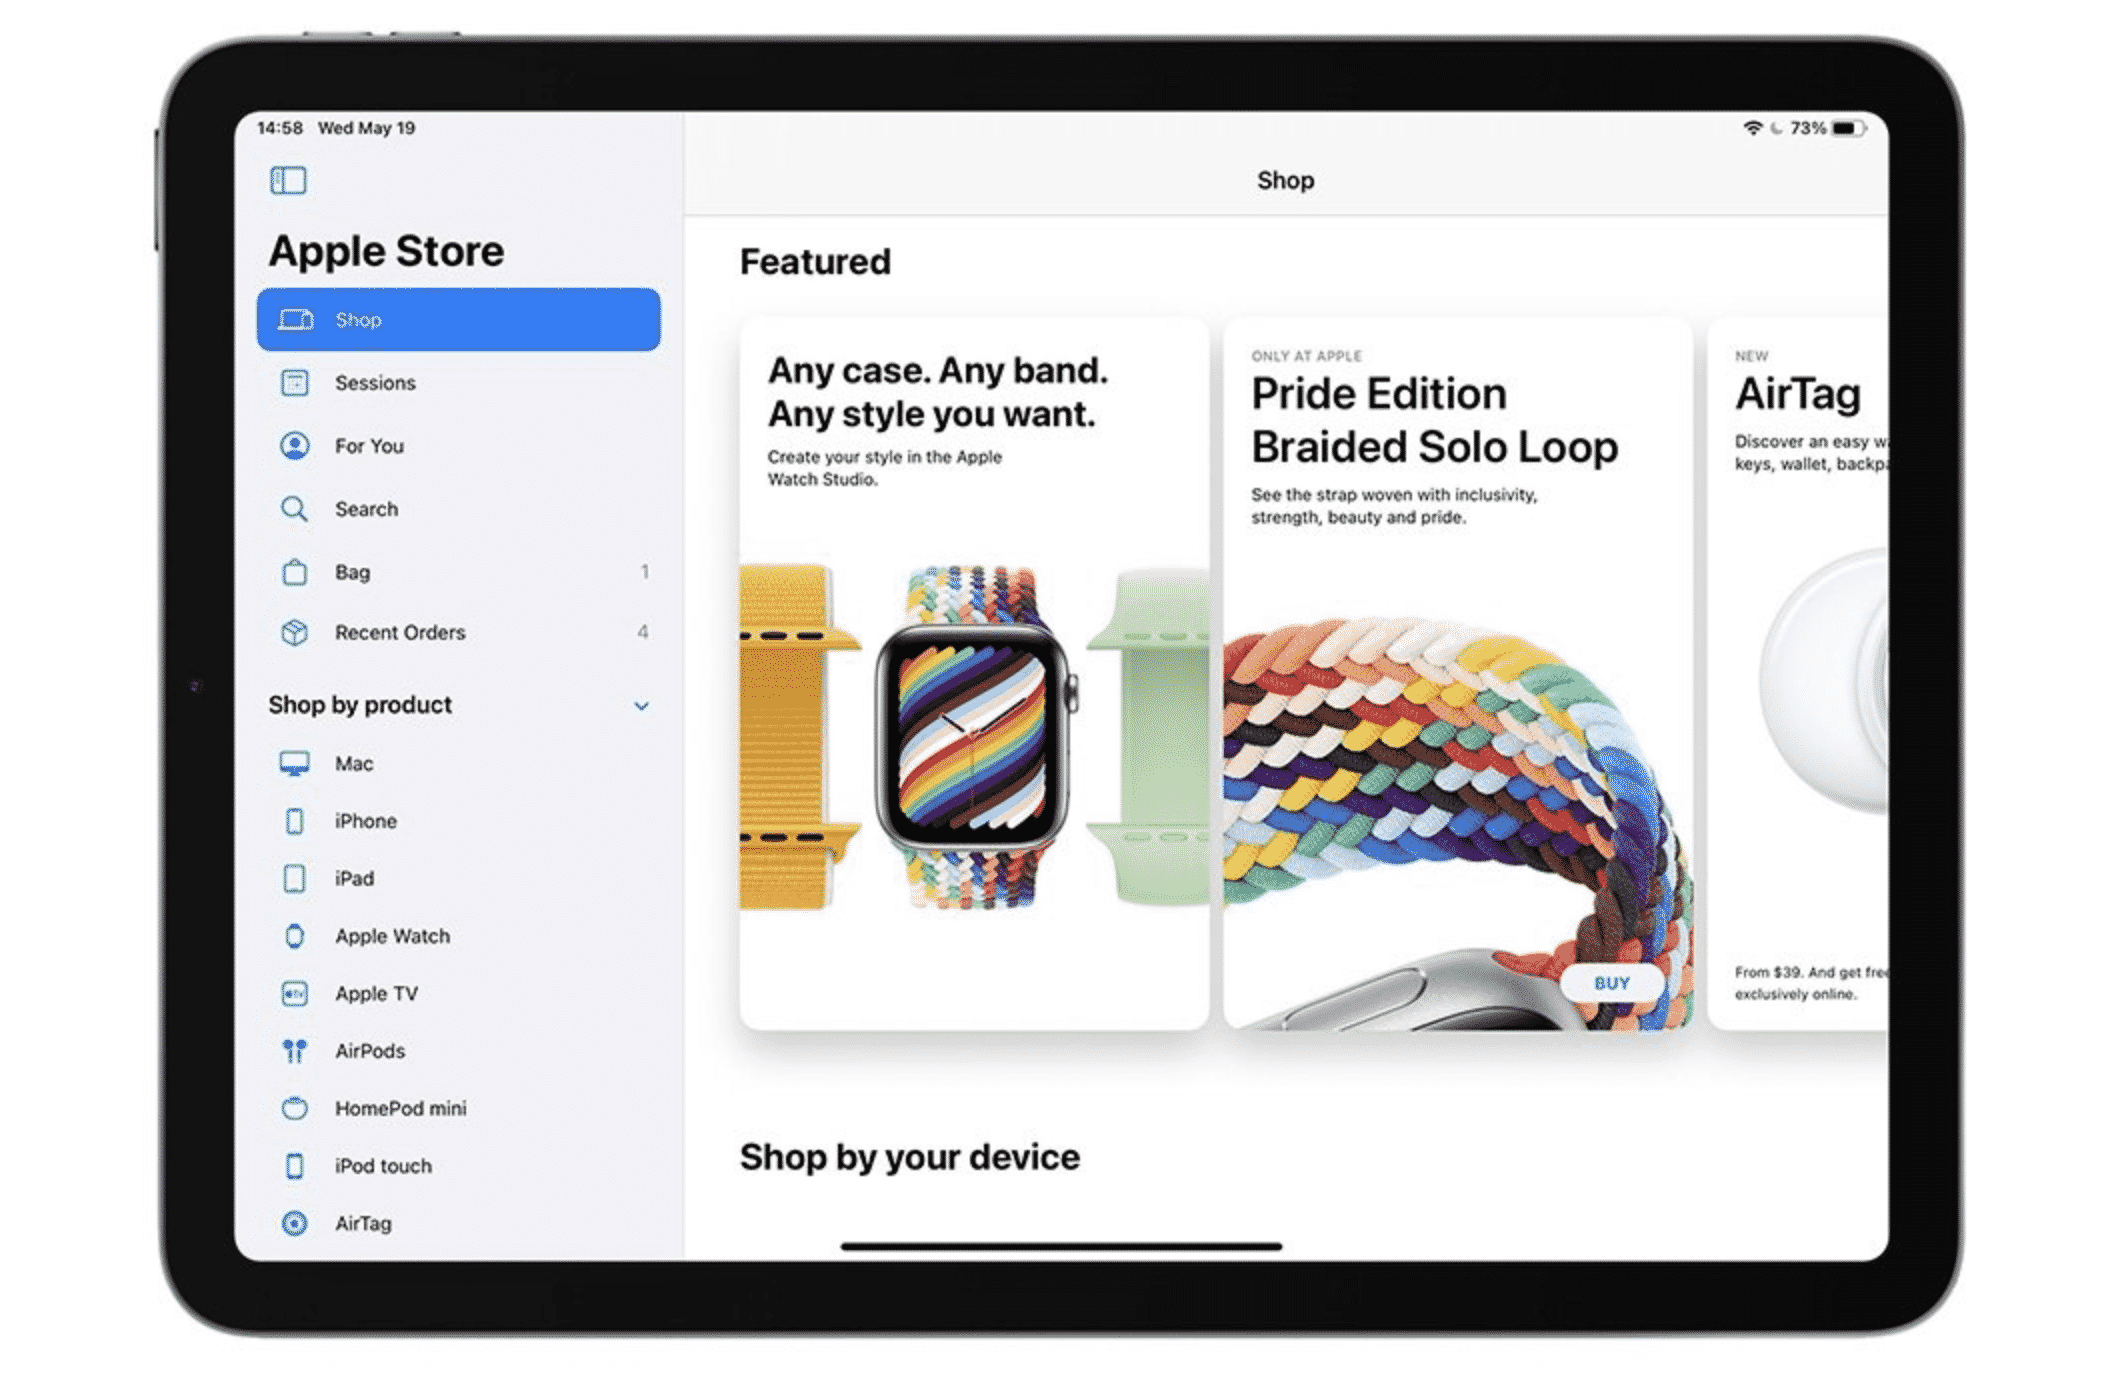 iPad Apple Store App